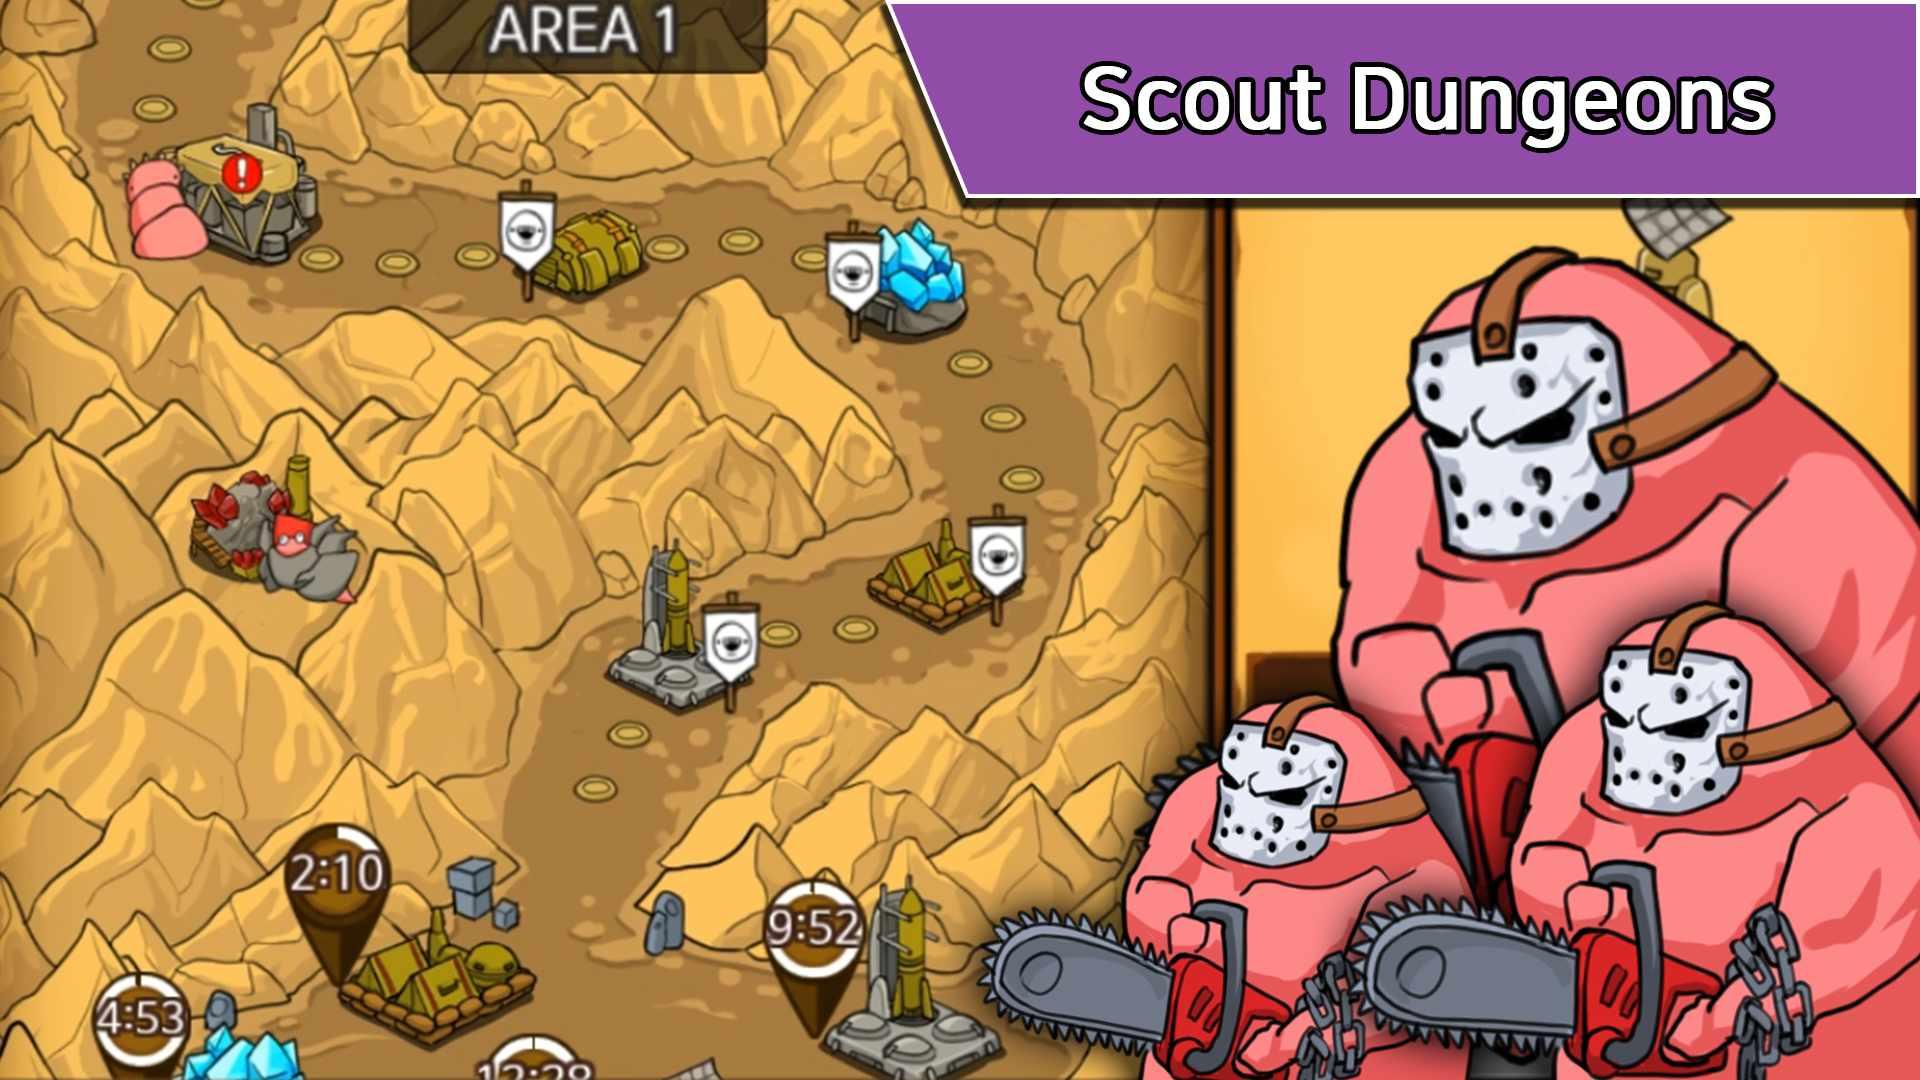 دانلود Missile Dude RPG: Tap Tap Missile v76 – بازی دوست موشکی اندروید